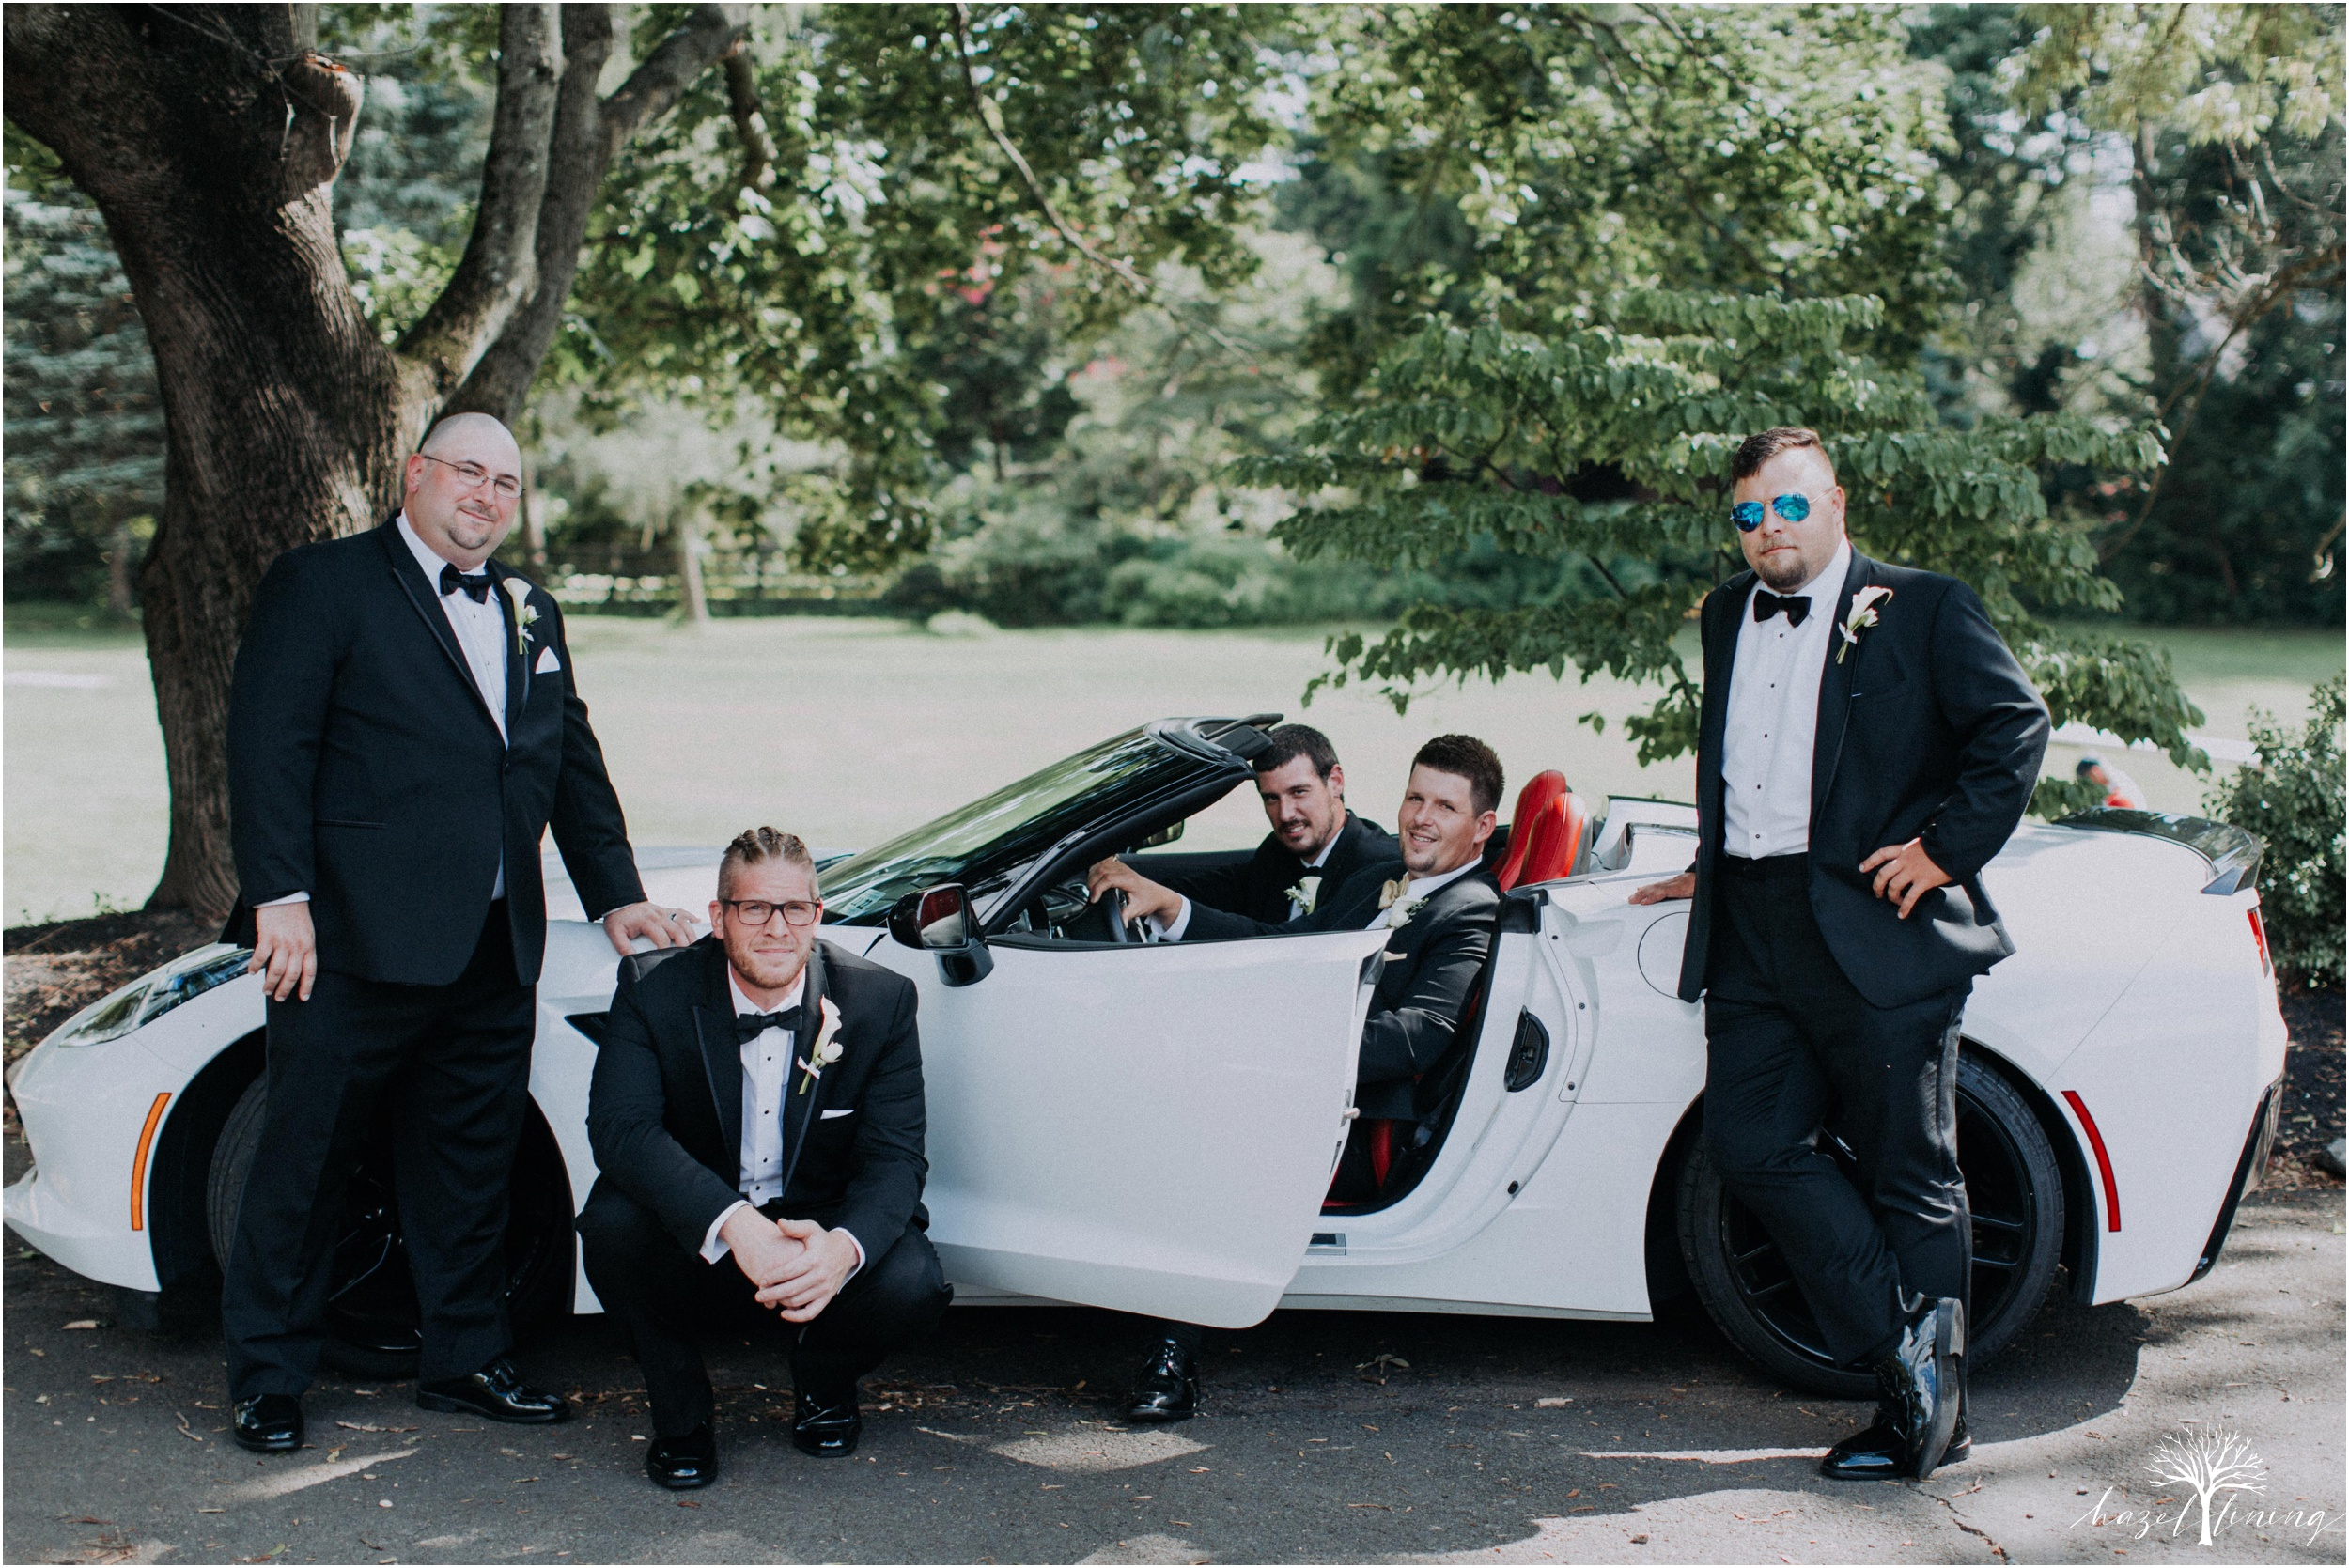 elizabeth-doelp-andrew-foreback-middletown-country-club-summer-langhorne-pennsylvania-wedding-hazel-lining-travel-wedding-elopement-photography_0074.jpg